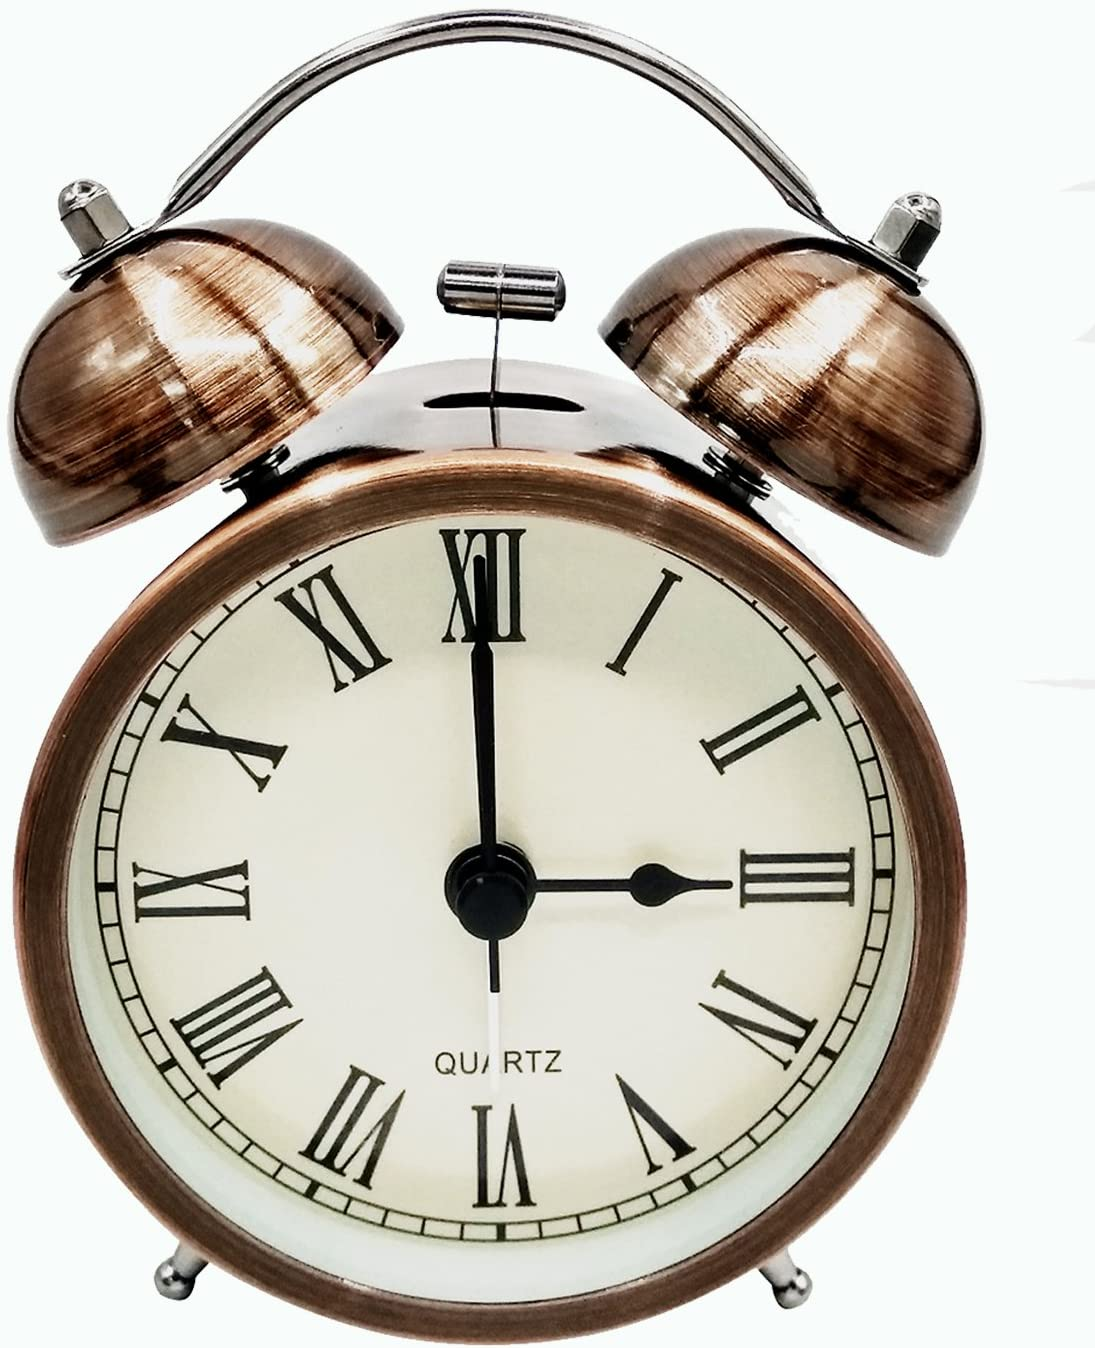 COOJA Vintage Reloj Despertador de Doble Campana con Sonido Fuerte, Alarma Despertador sin Tic TAC Silencioso Analogico Despertadores de Viaje para Infantil Juvenil Niña (3 Pulgadas)